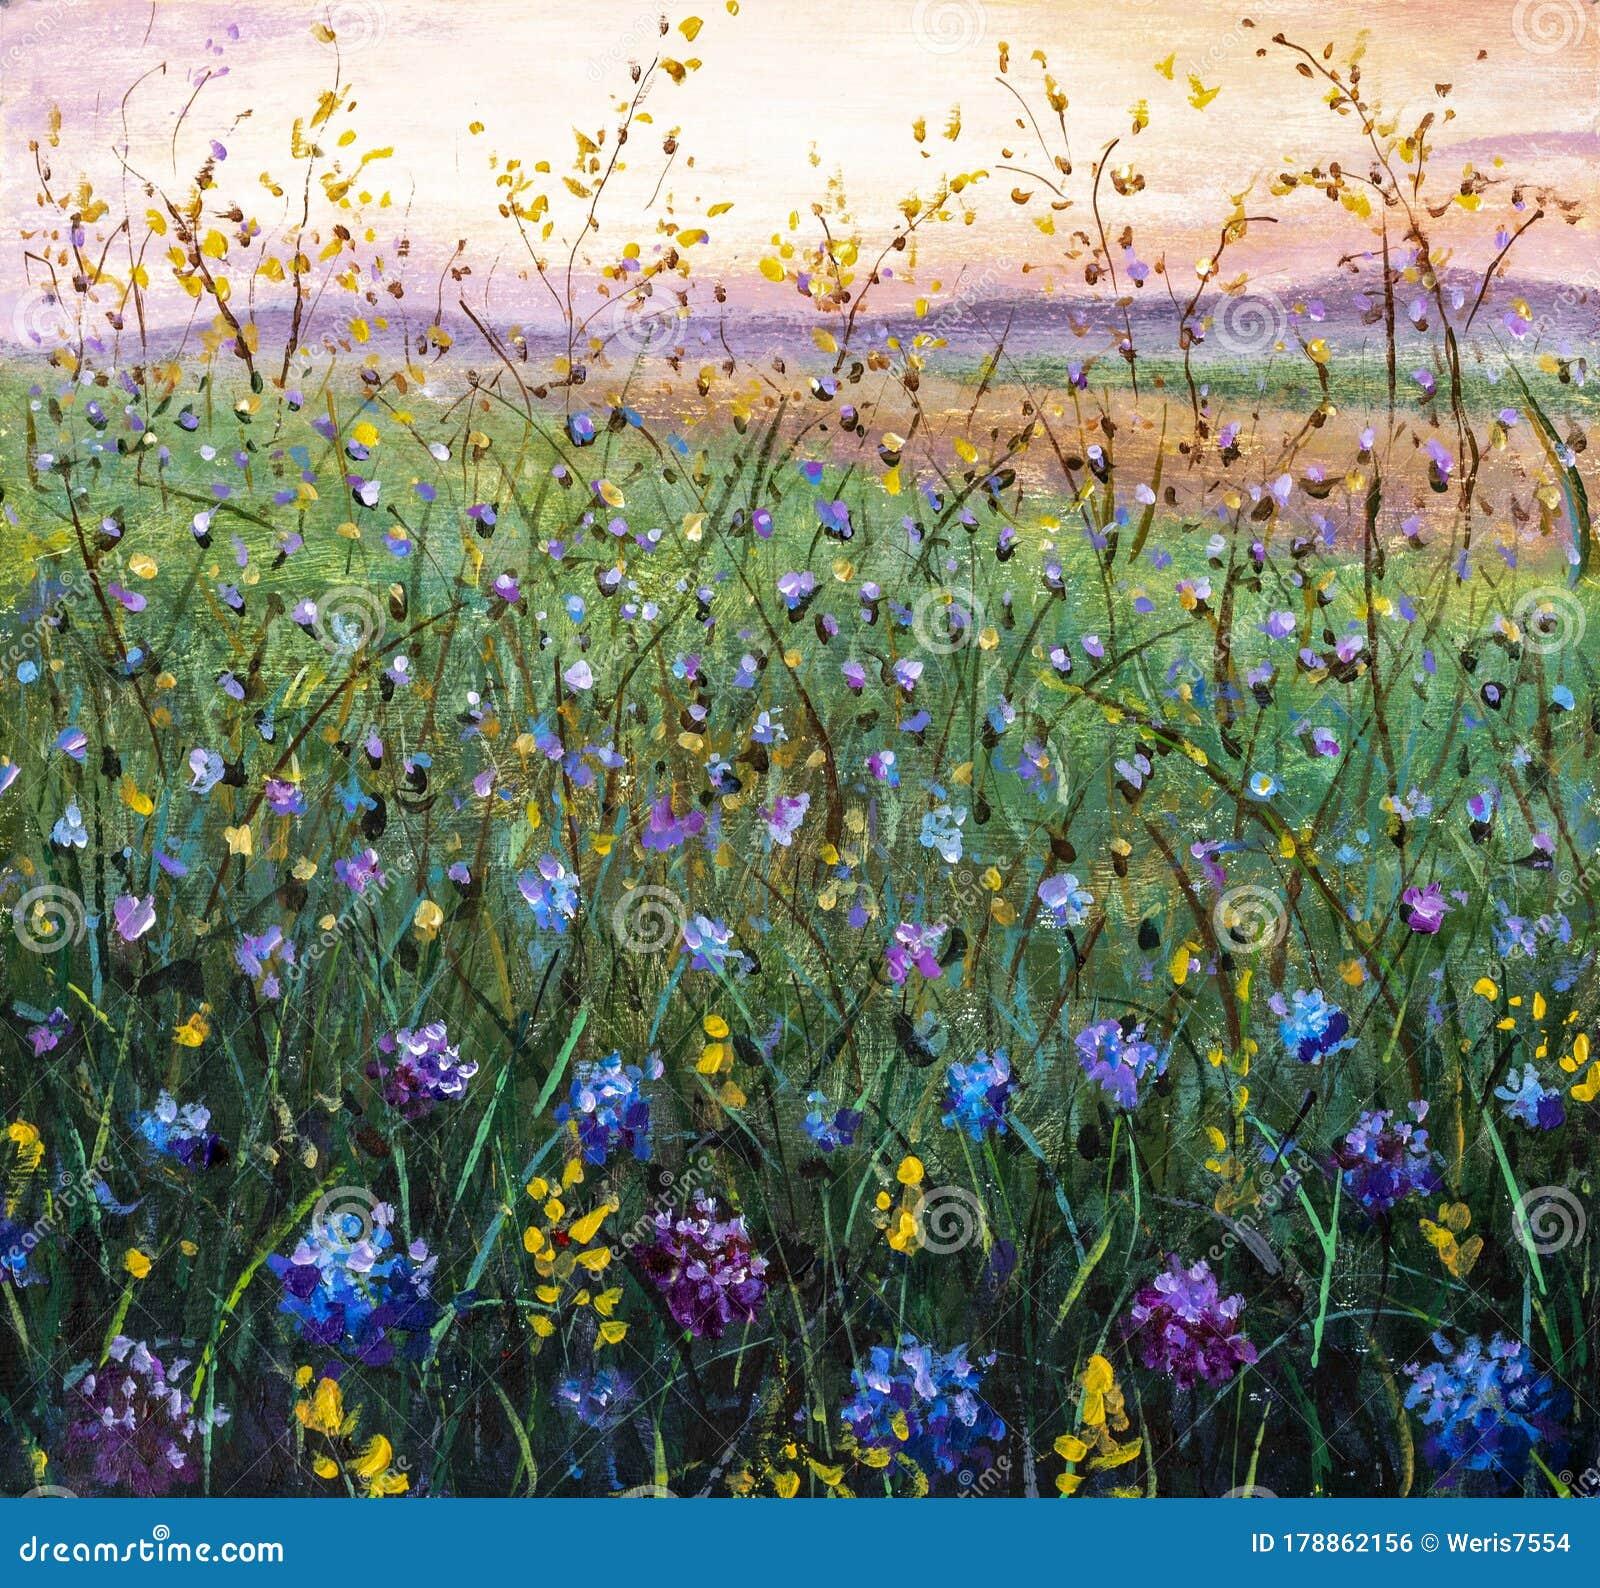 Original Oil Painting Of Flowers Beautiful Field Flowers On Canvas Stock Photo Image Of Artwork Artist 178862156